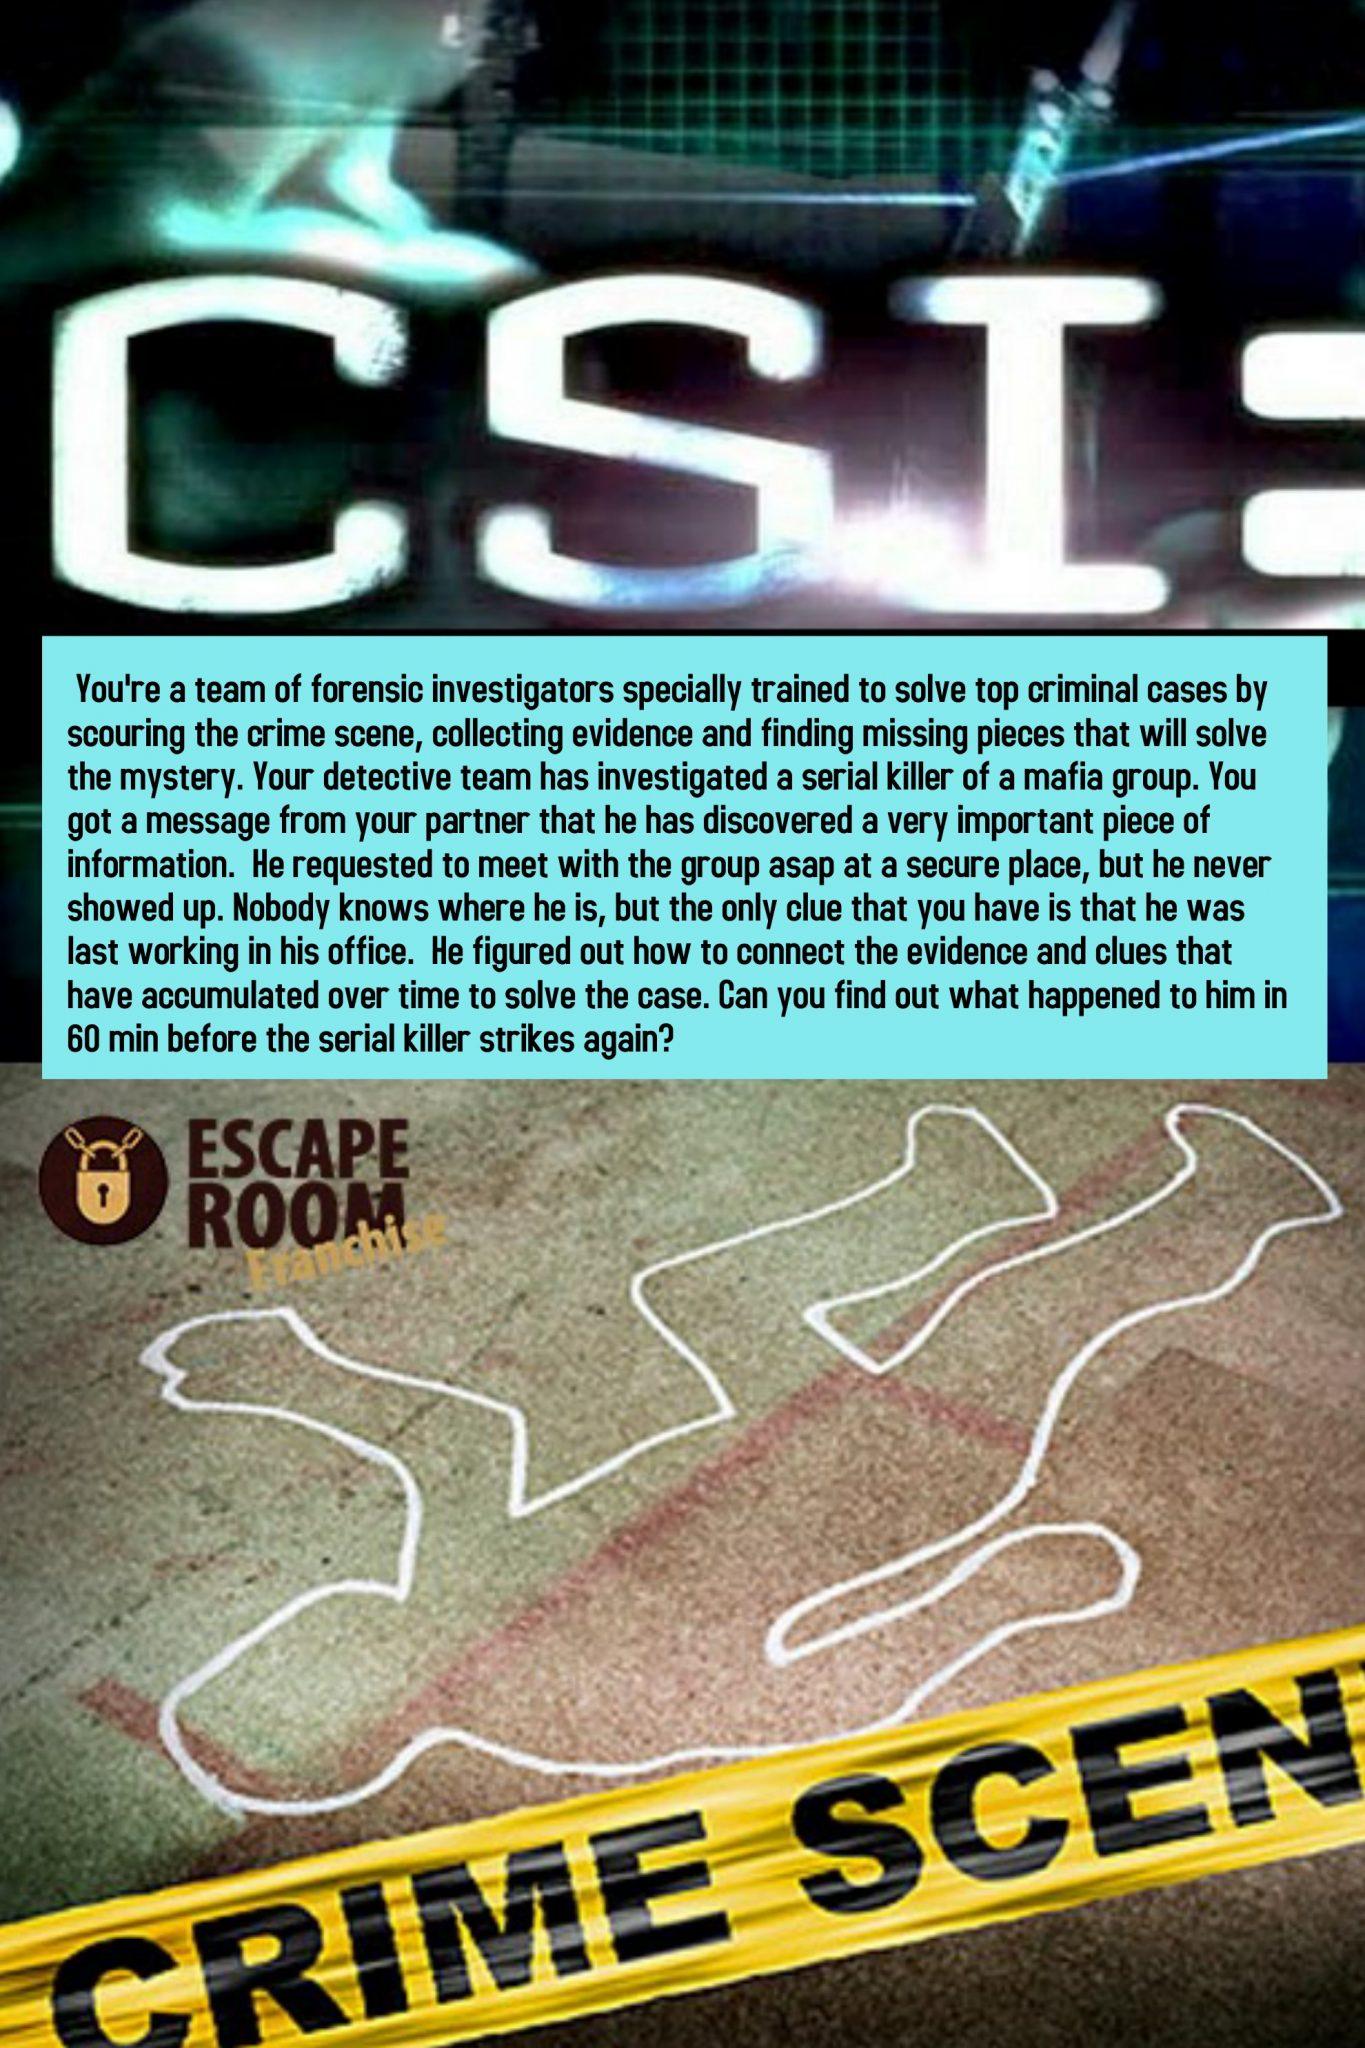 CSI (TOP PICKED ROOM)